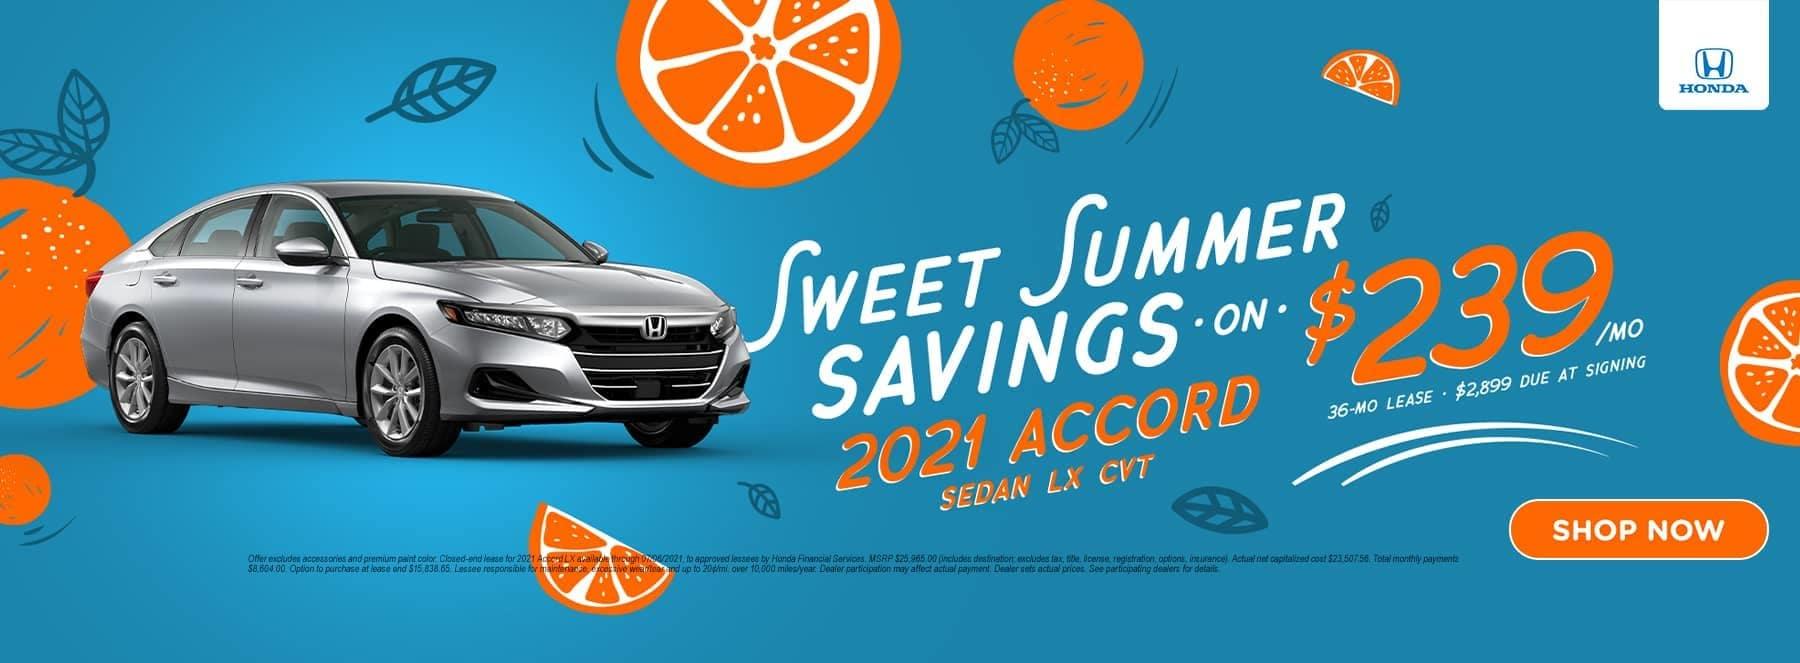 Sweet Summer Savings 2021 Accord Sedan LX CVT